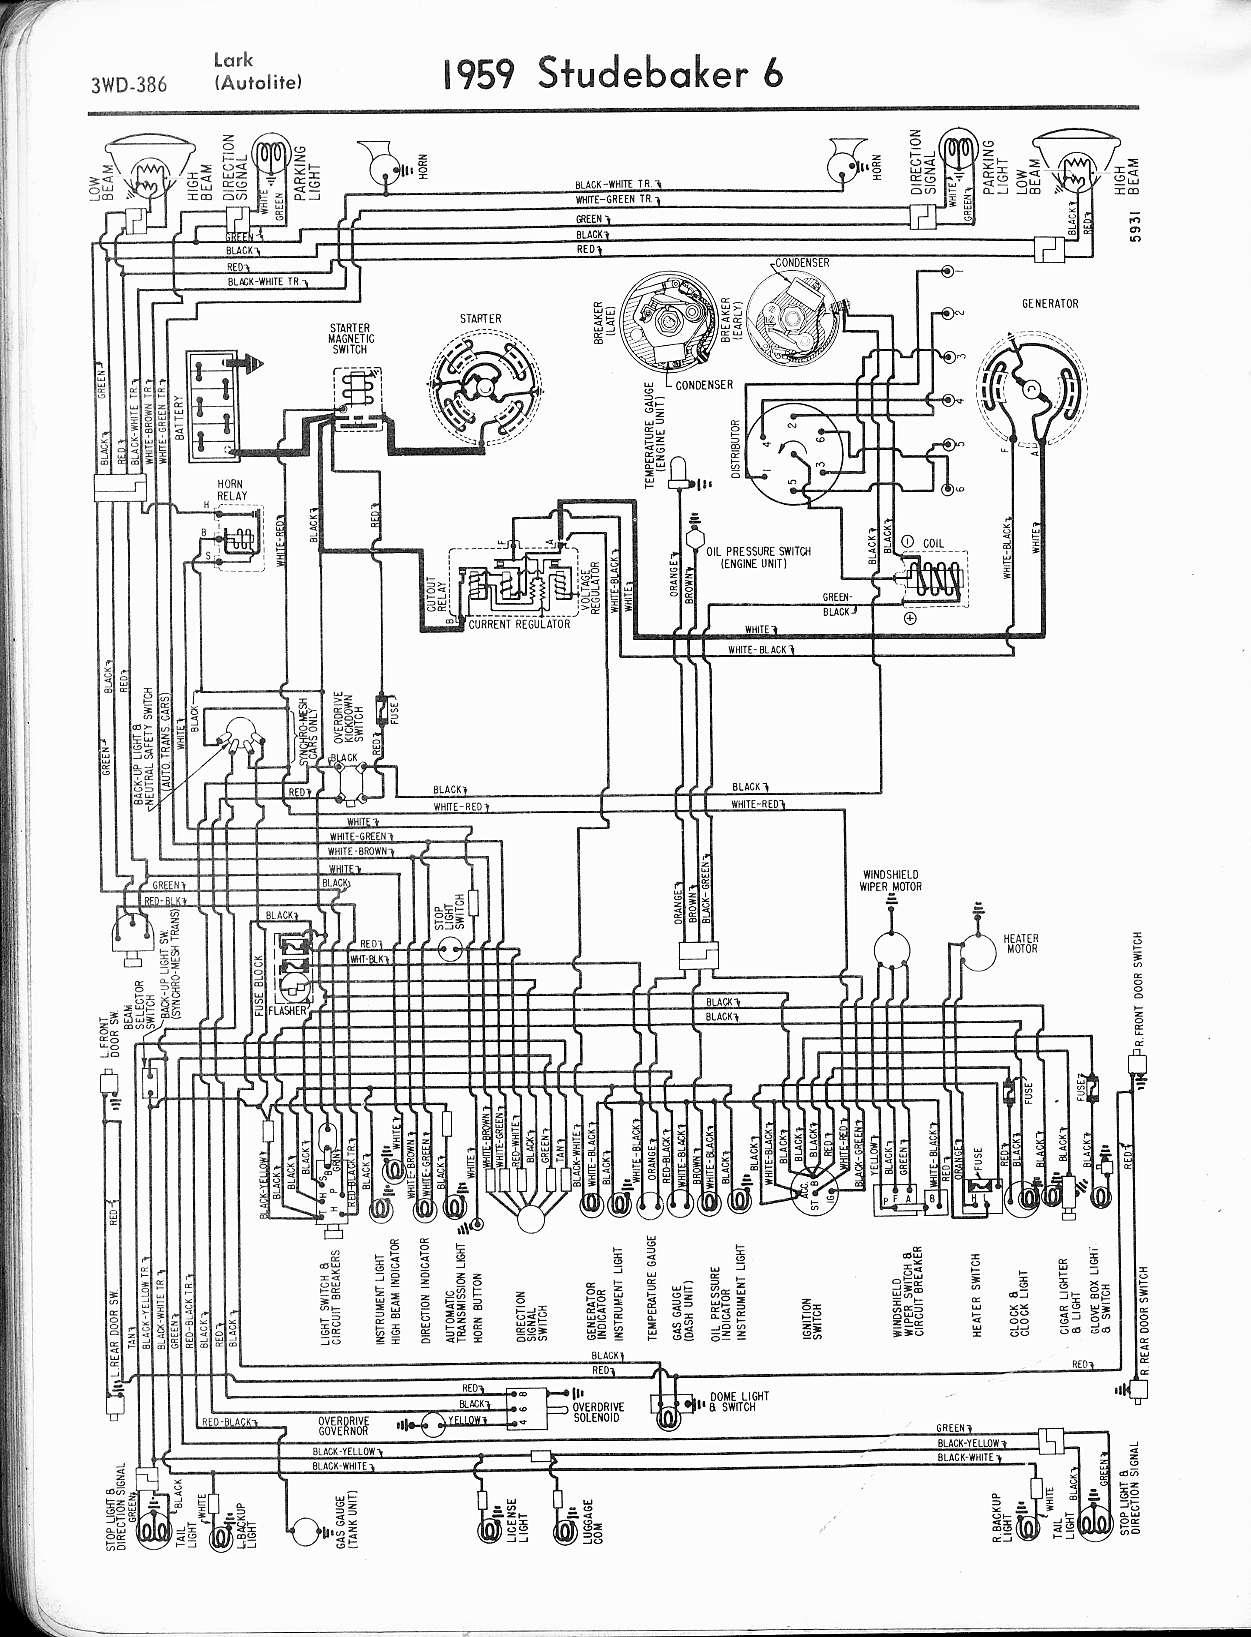 [DIAGRAM_4PO]  Automotive Wiring Diagrams Manual - Bus Electrical Wiring Diagrams for Wiring  Diagram Schematics   Vintage Car Wiring Diagram Basic      Wiring Diagram Schematics